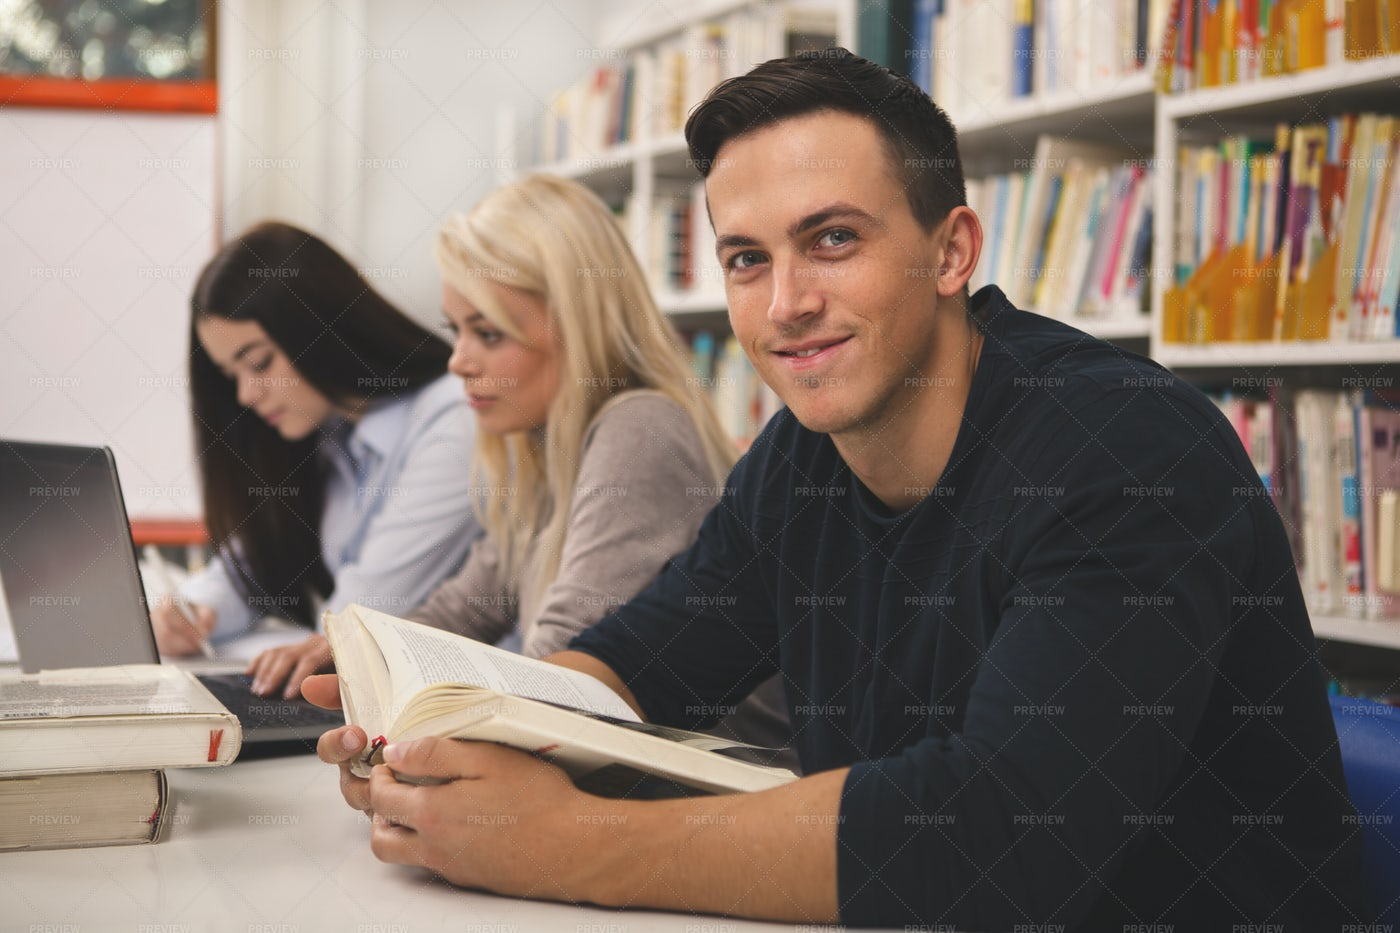 Study Group Reading Books: Stock Photos